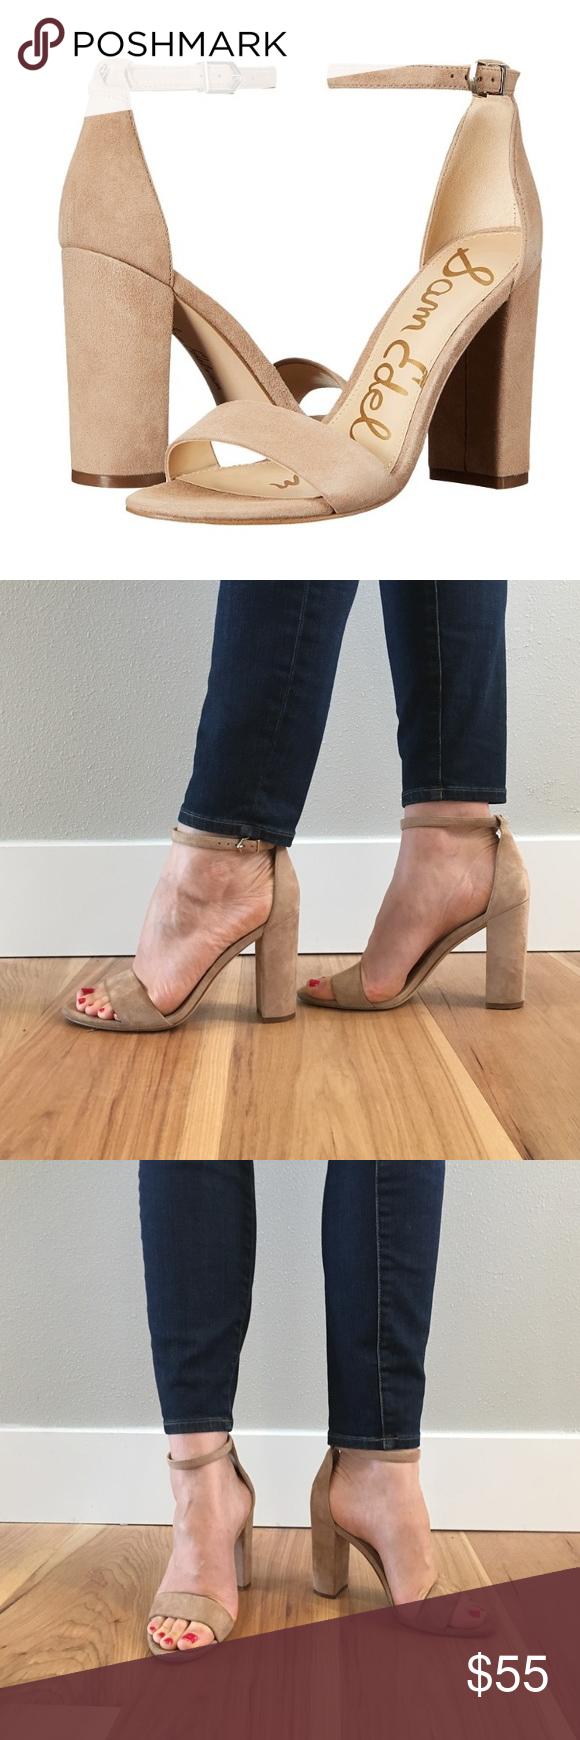 207b069f840a59 Sam Edelman Yaro Heel Sam Edelman nude oatmeal colored suede Yaro block heel  with ankle